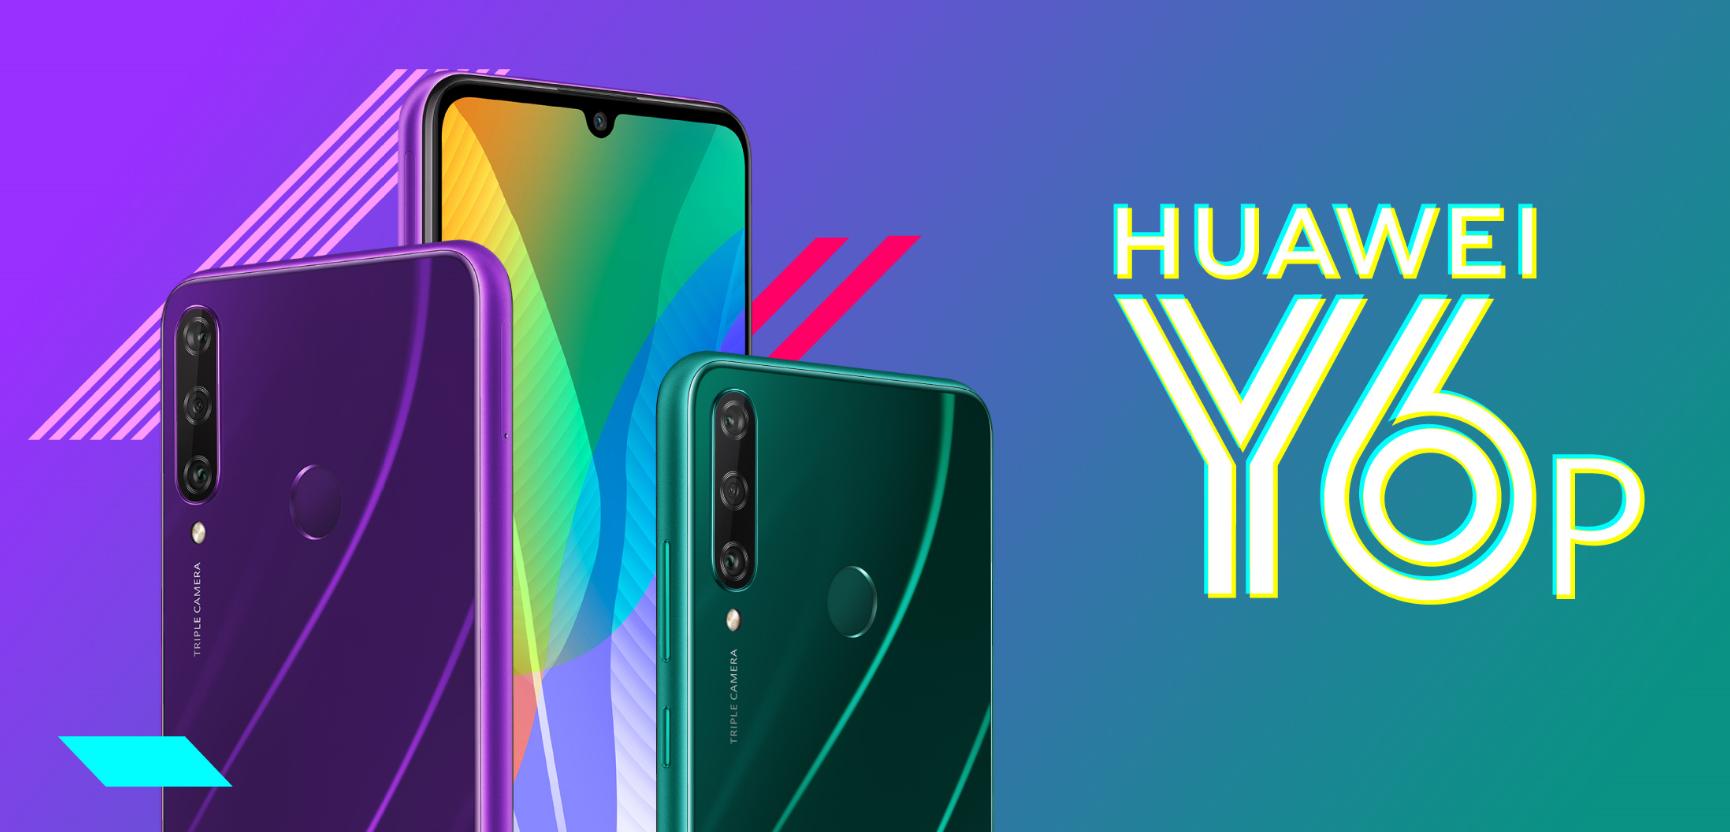 Huawei Y6p Viu Premium